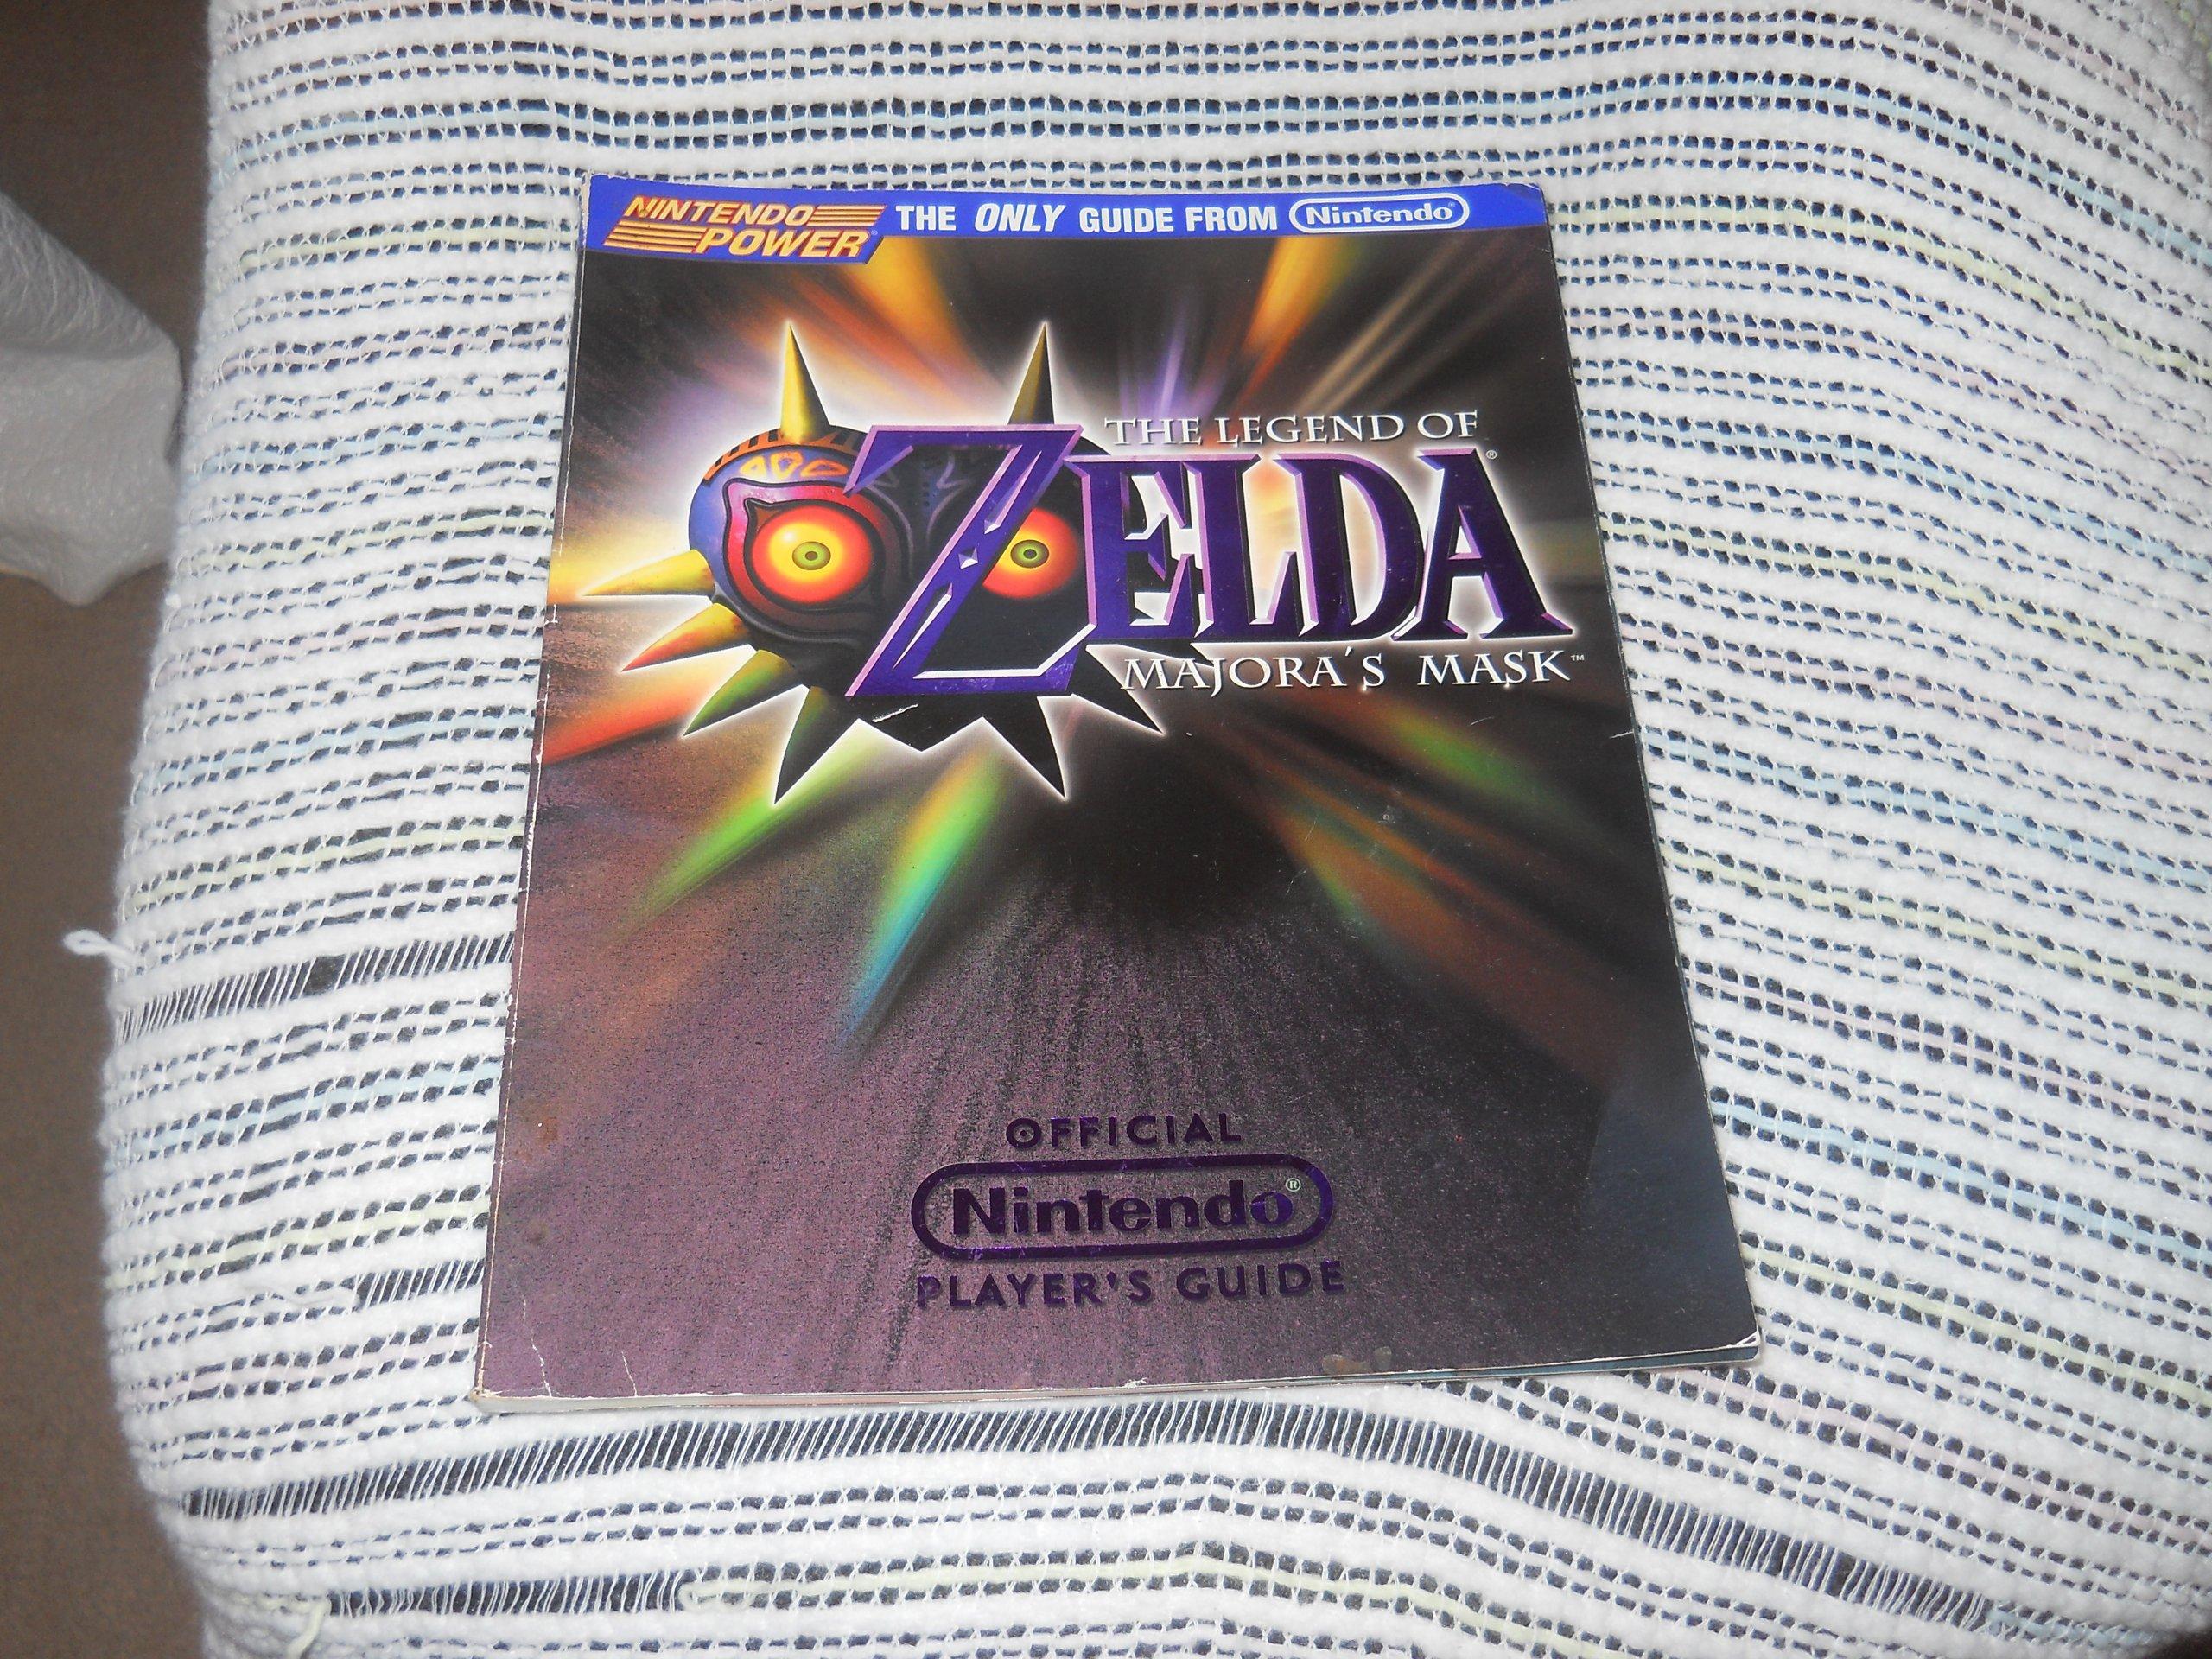 Official Nintendo Power The Legend Of Zelda  Majora's Mask Player's Guide